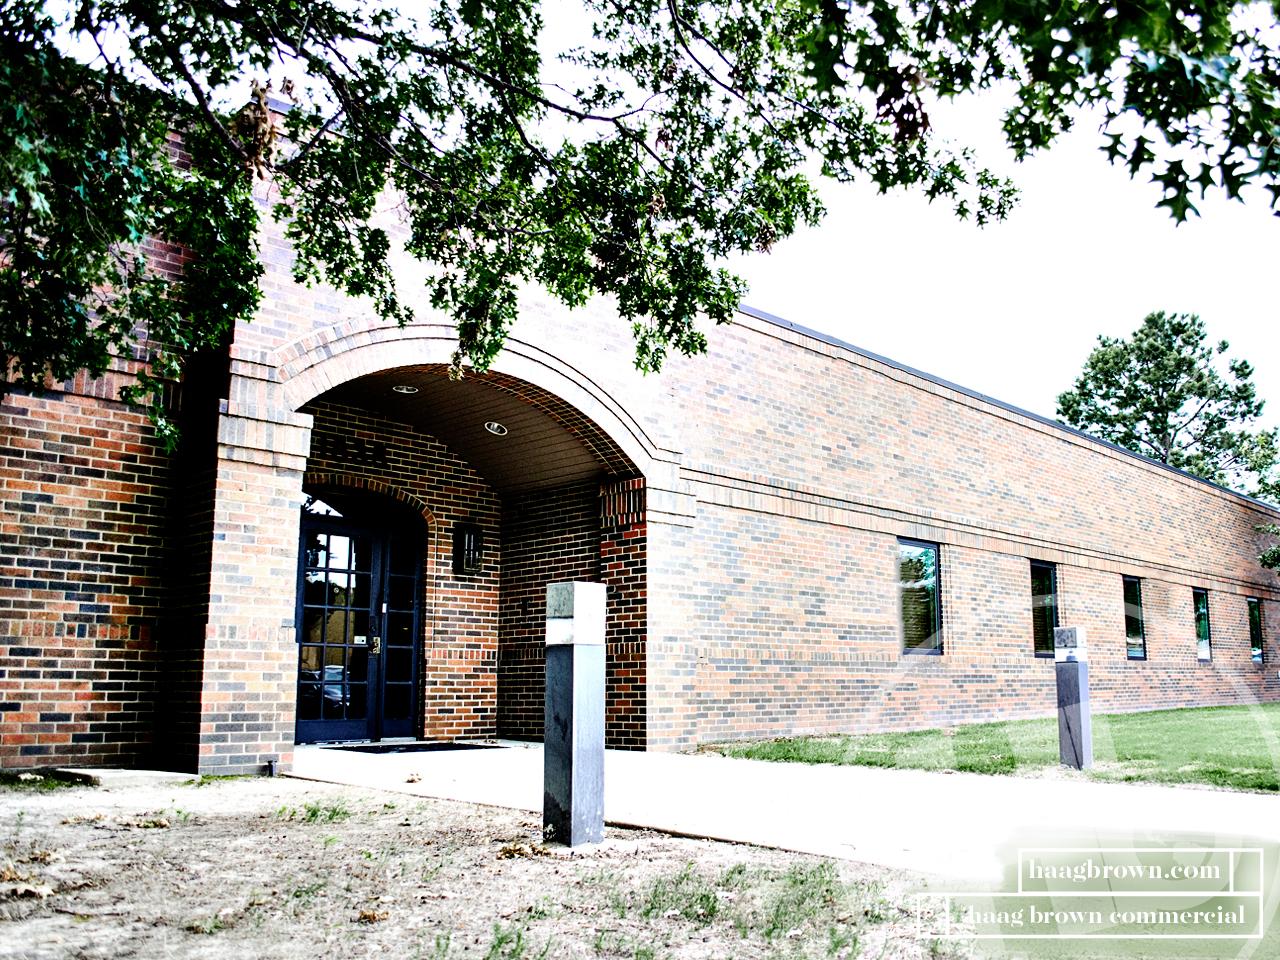 Grant Street Office in Jonesboro, AR